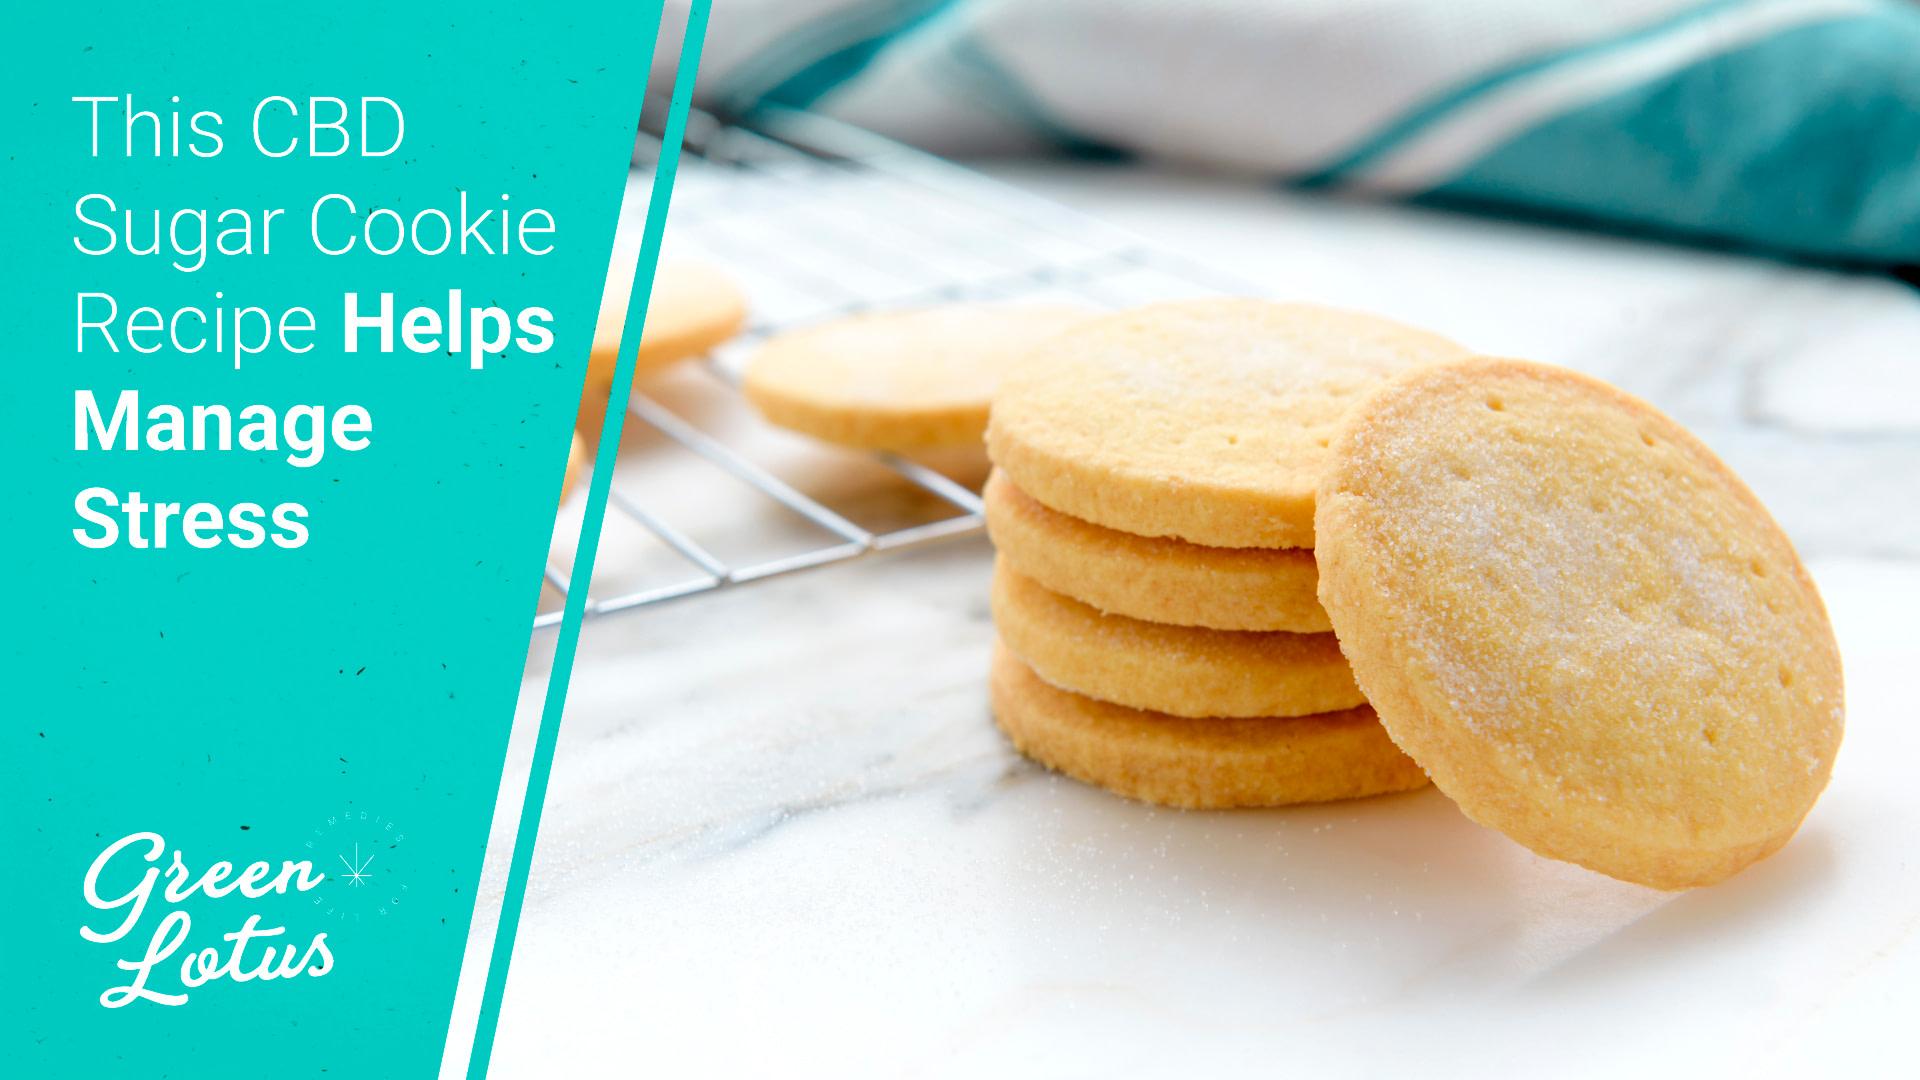 This CBD Sugar Cookies Recipe Helps Manage Stress